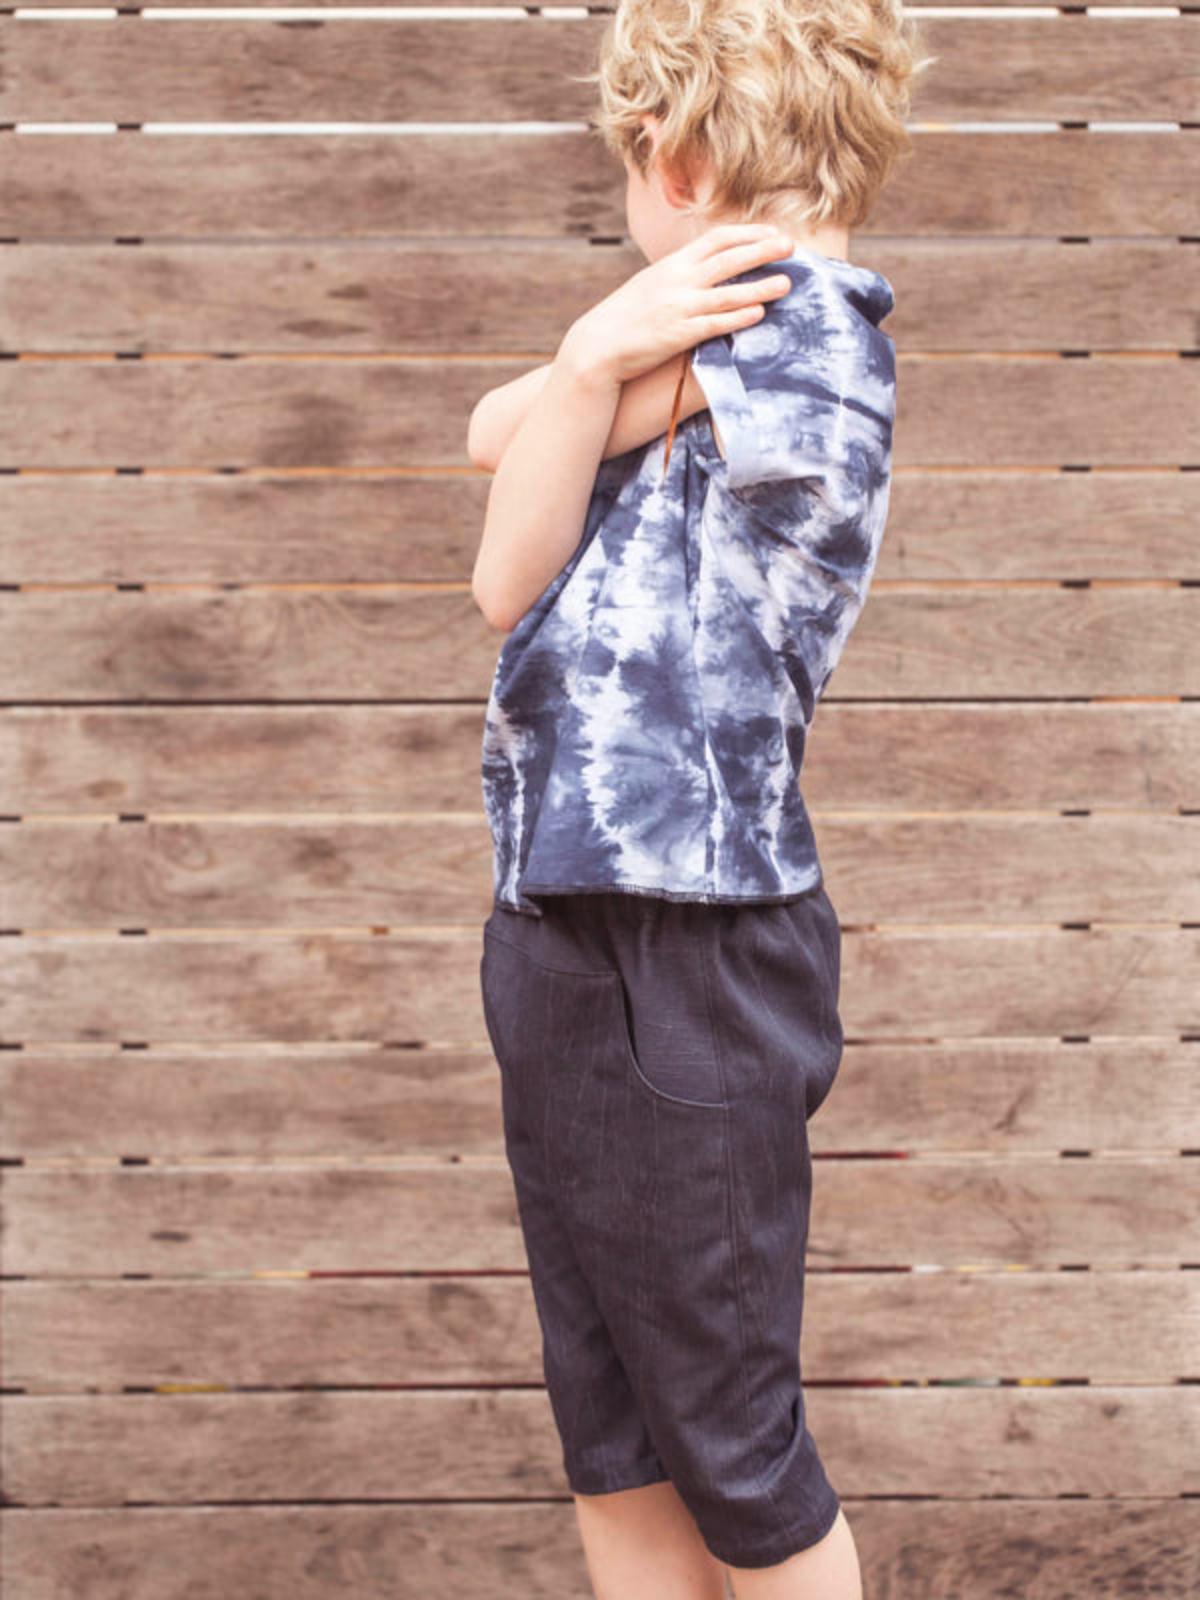 Pez Punto. Camiseta teñida para niños. Design Market Barcelona 2019